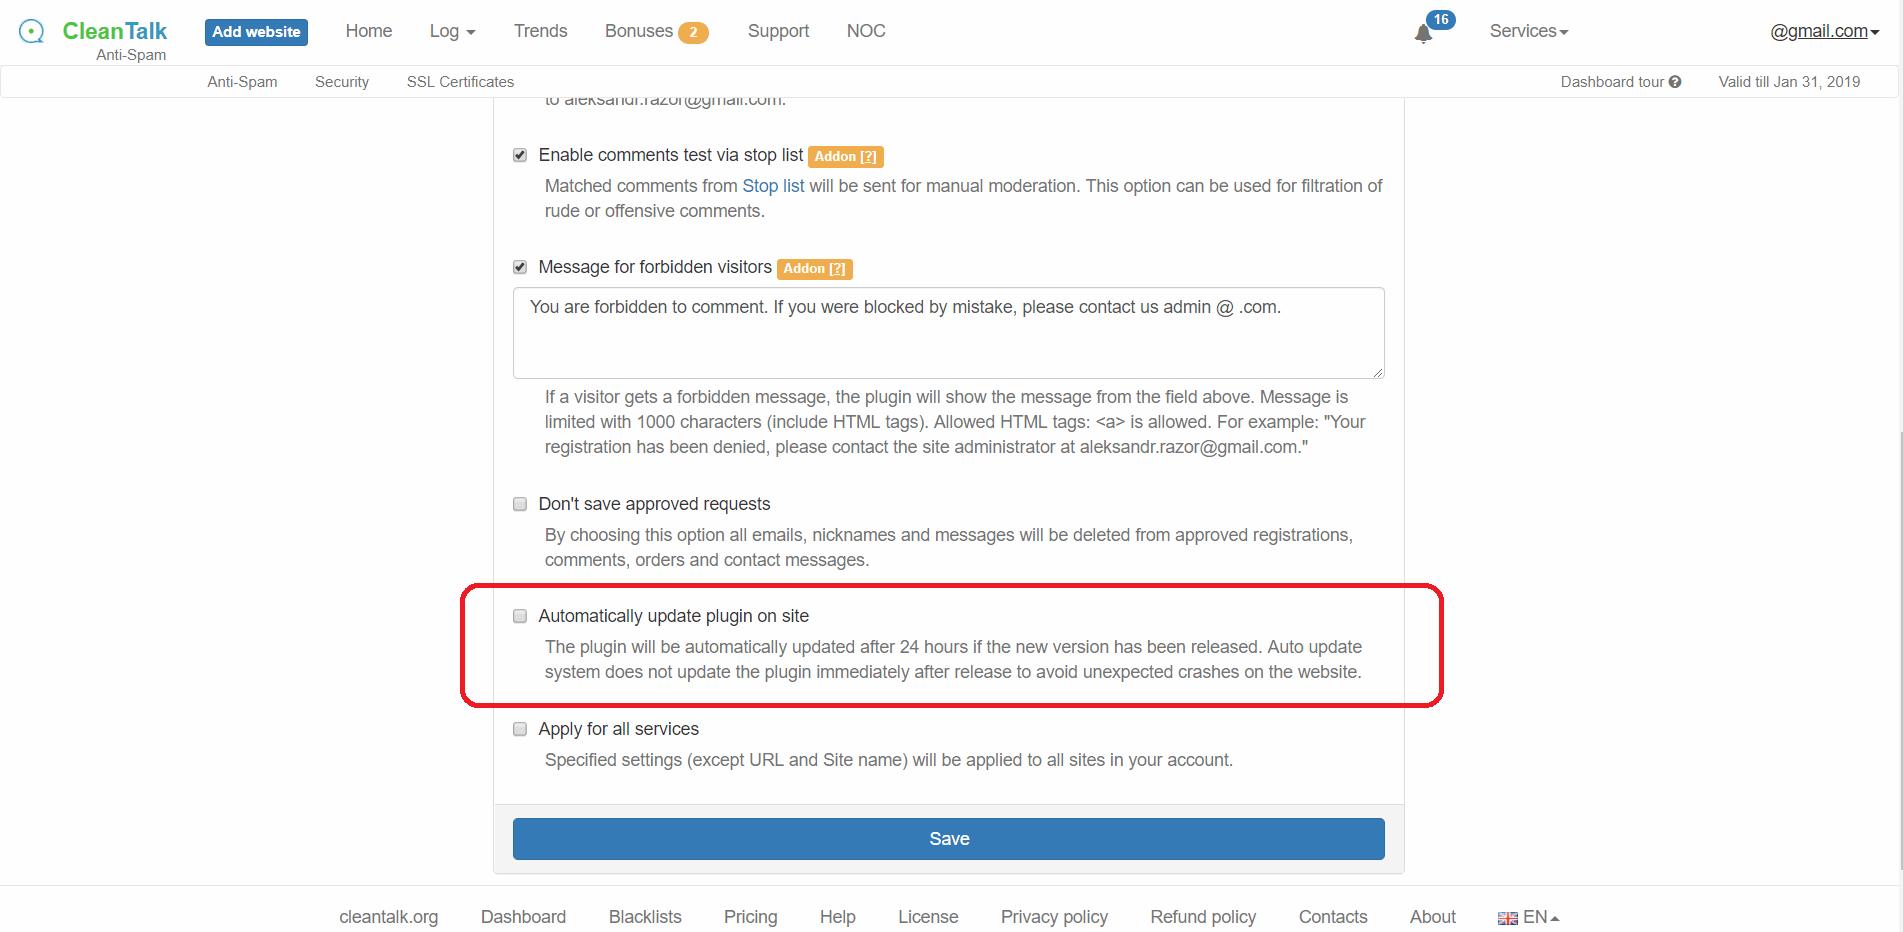 Auto update anti-spam option